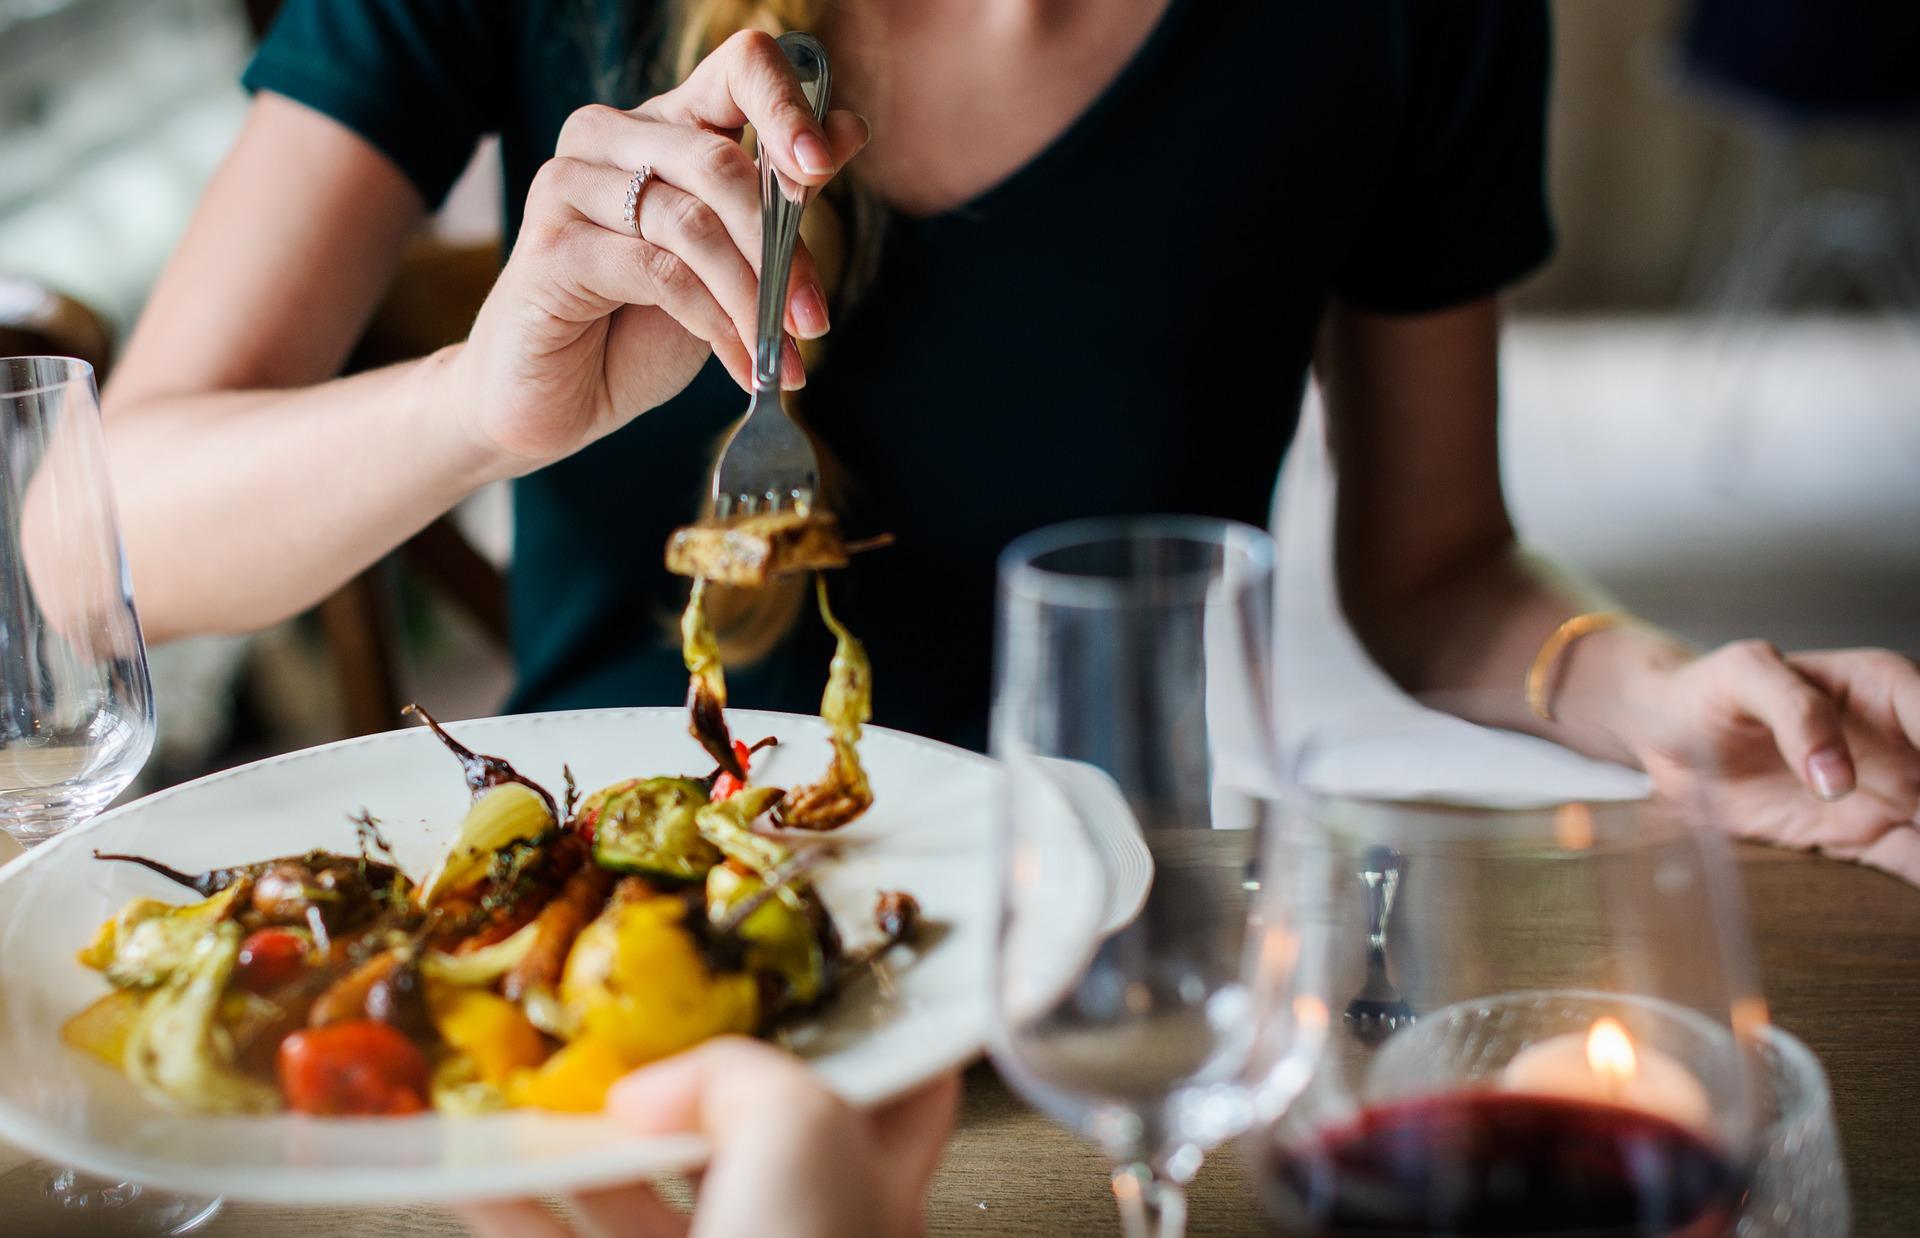 Restaurants Jumping On Customer Loyalty Bandwagon